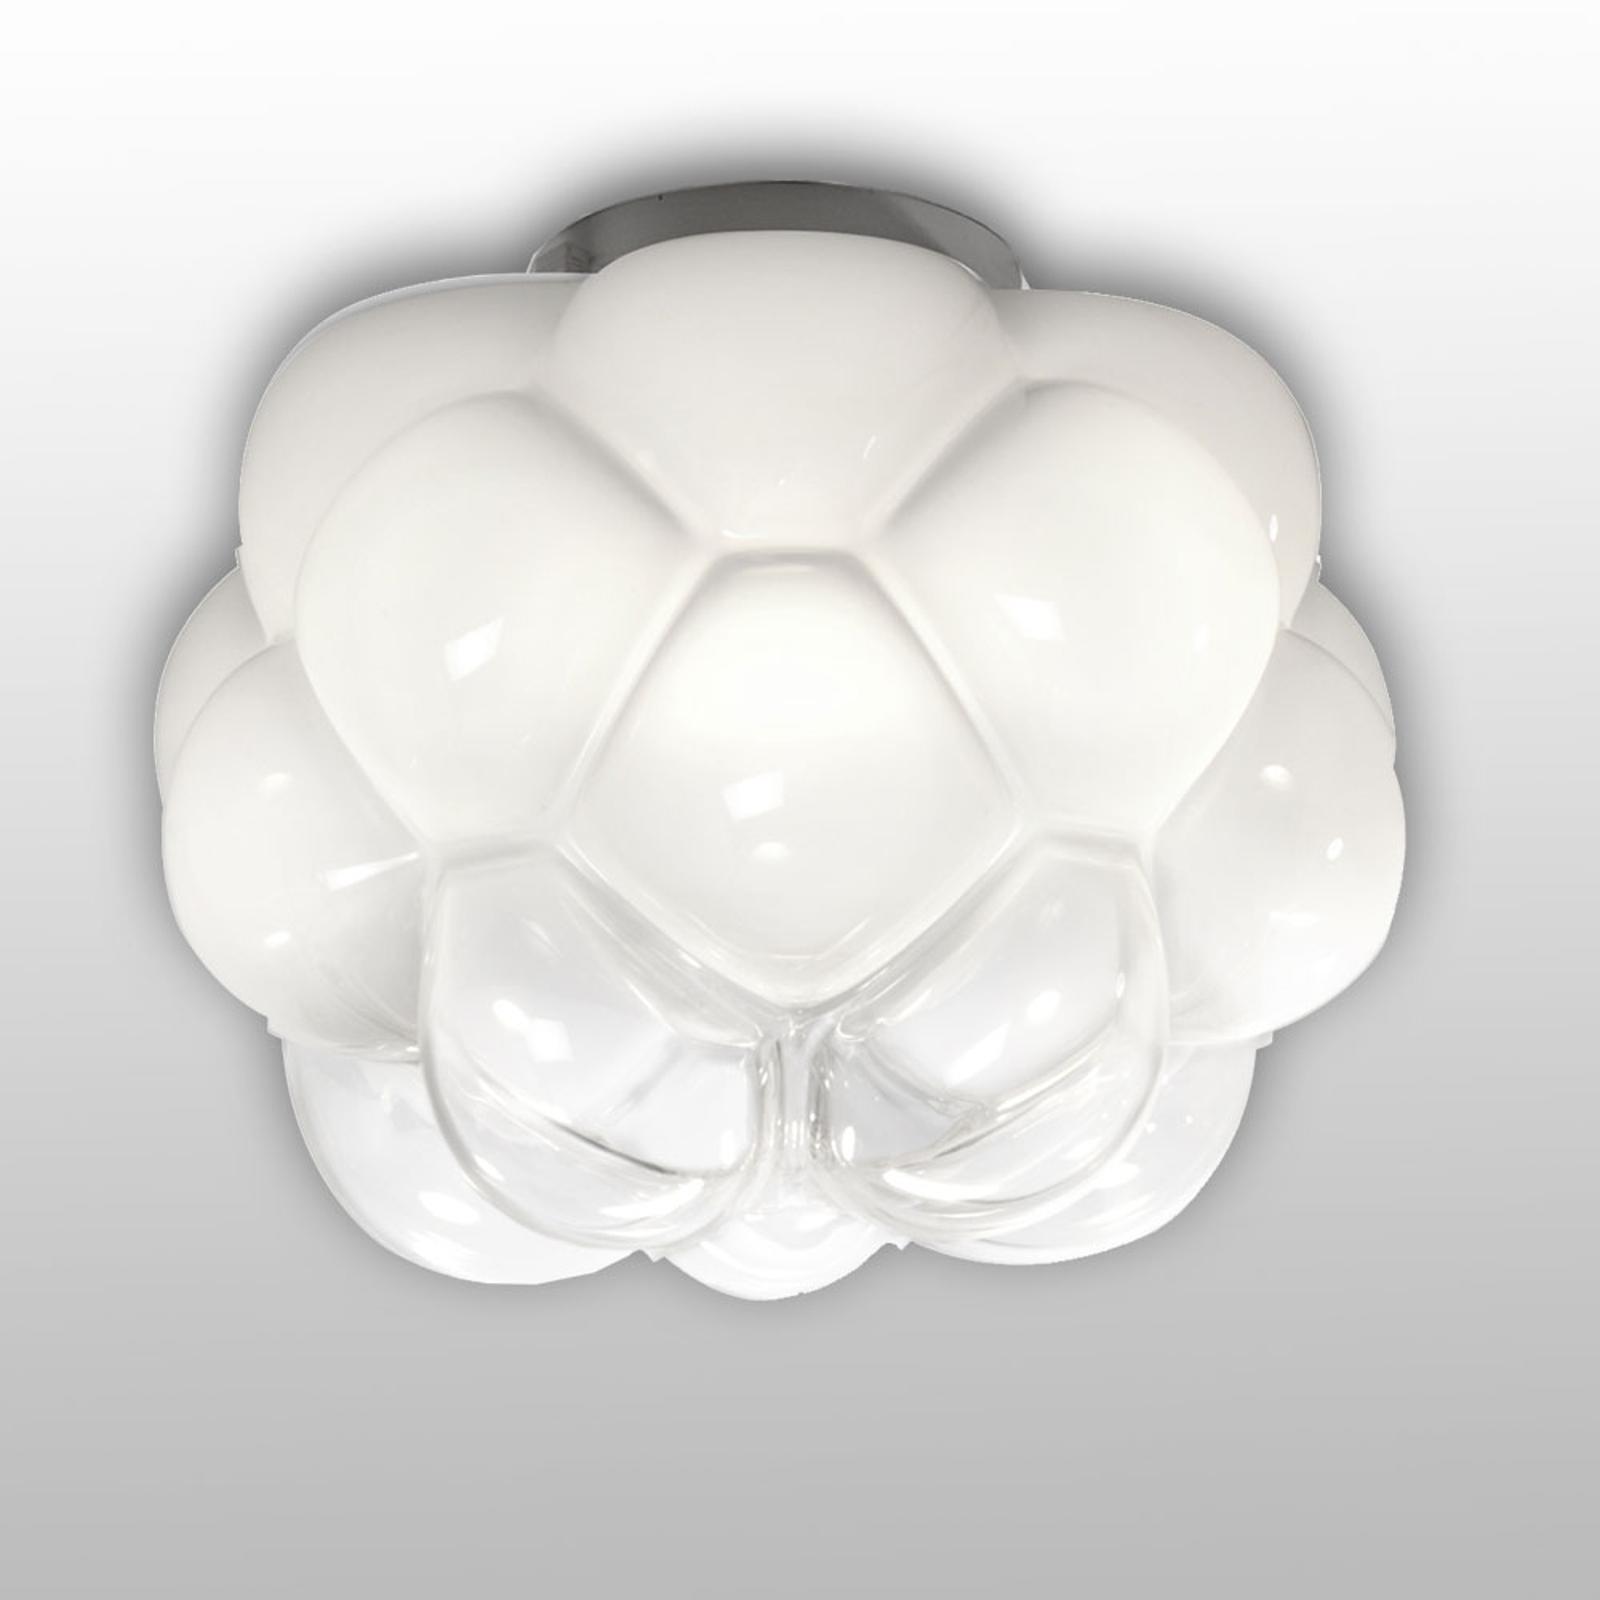 Skyformet LED-taklampe Cloudy, 26 cm